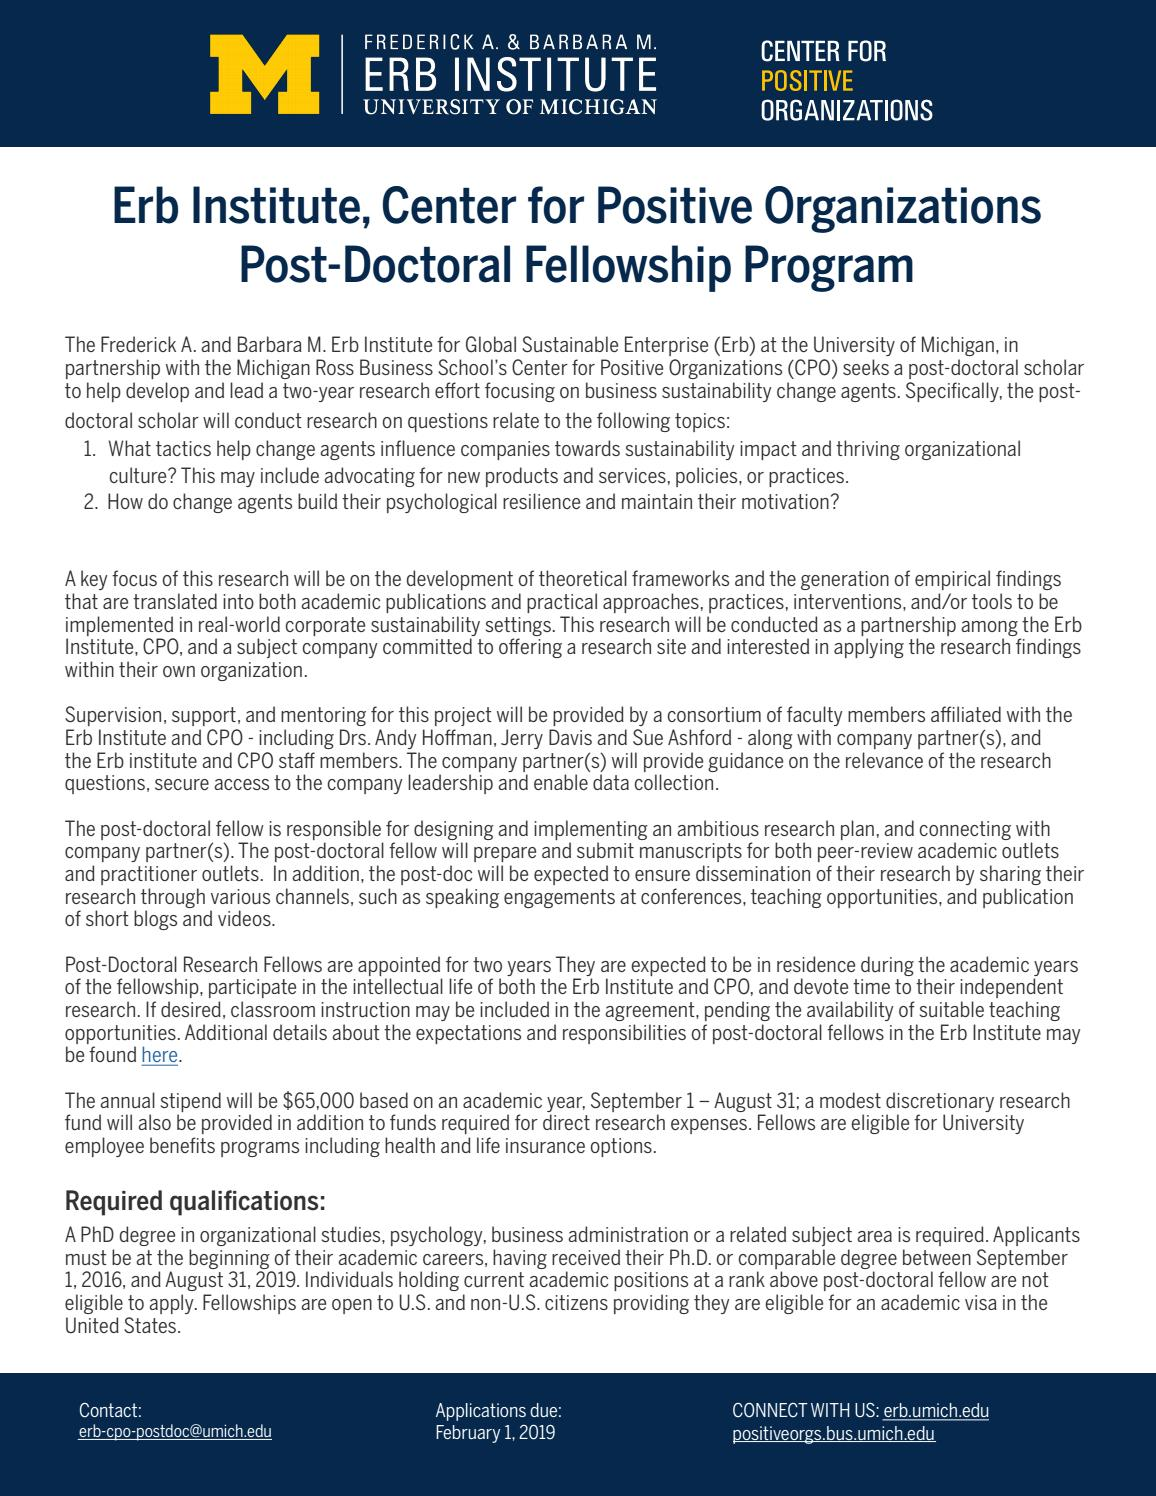 Erb Institute, Center for Positive Organizations Post